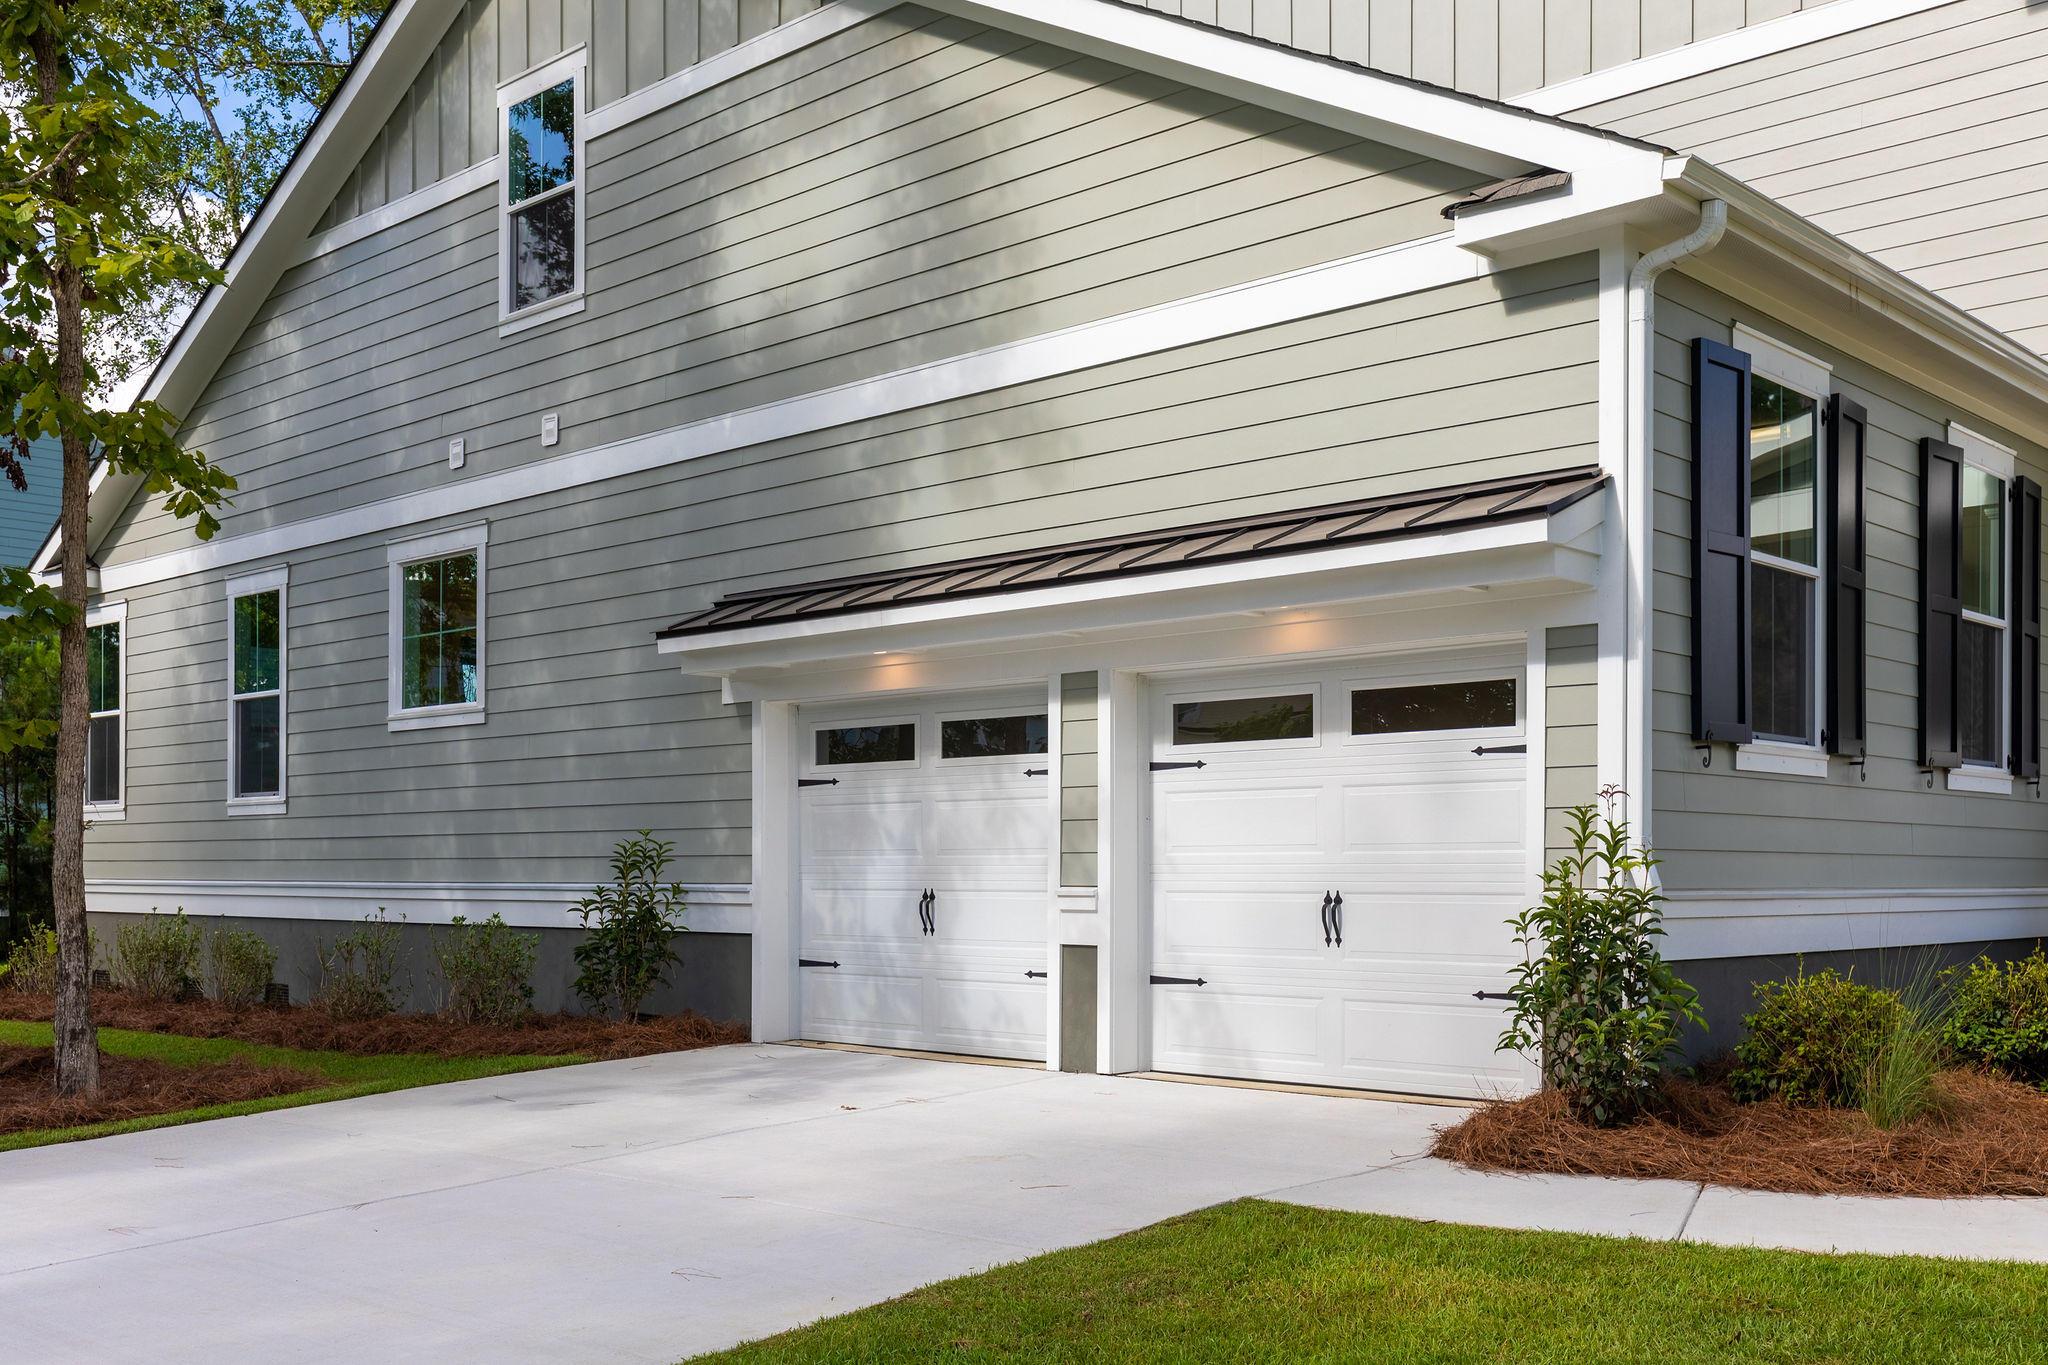 Park West Homes For Sale - 2291 Middlesex, Mount Pleasant, SC - 7